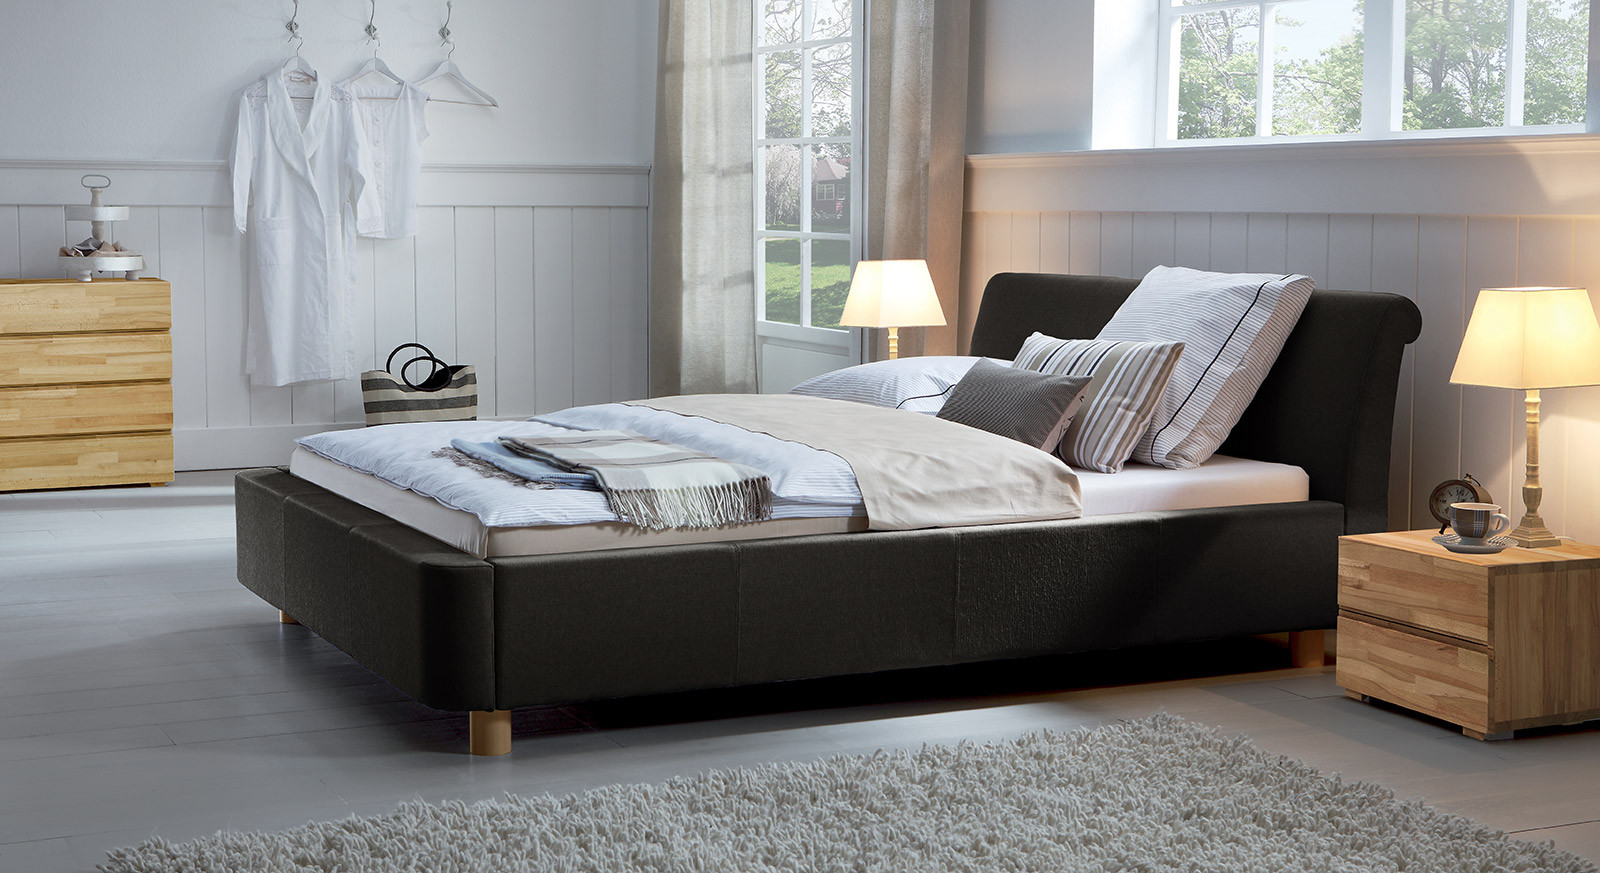 Bett 200x220  Stoffbett als Doppelbett z B in 200x220 erhältlich Andorra